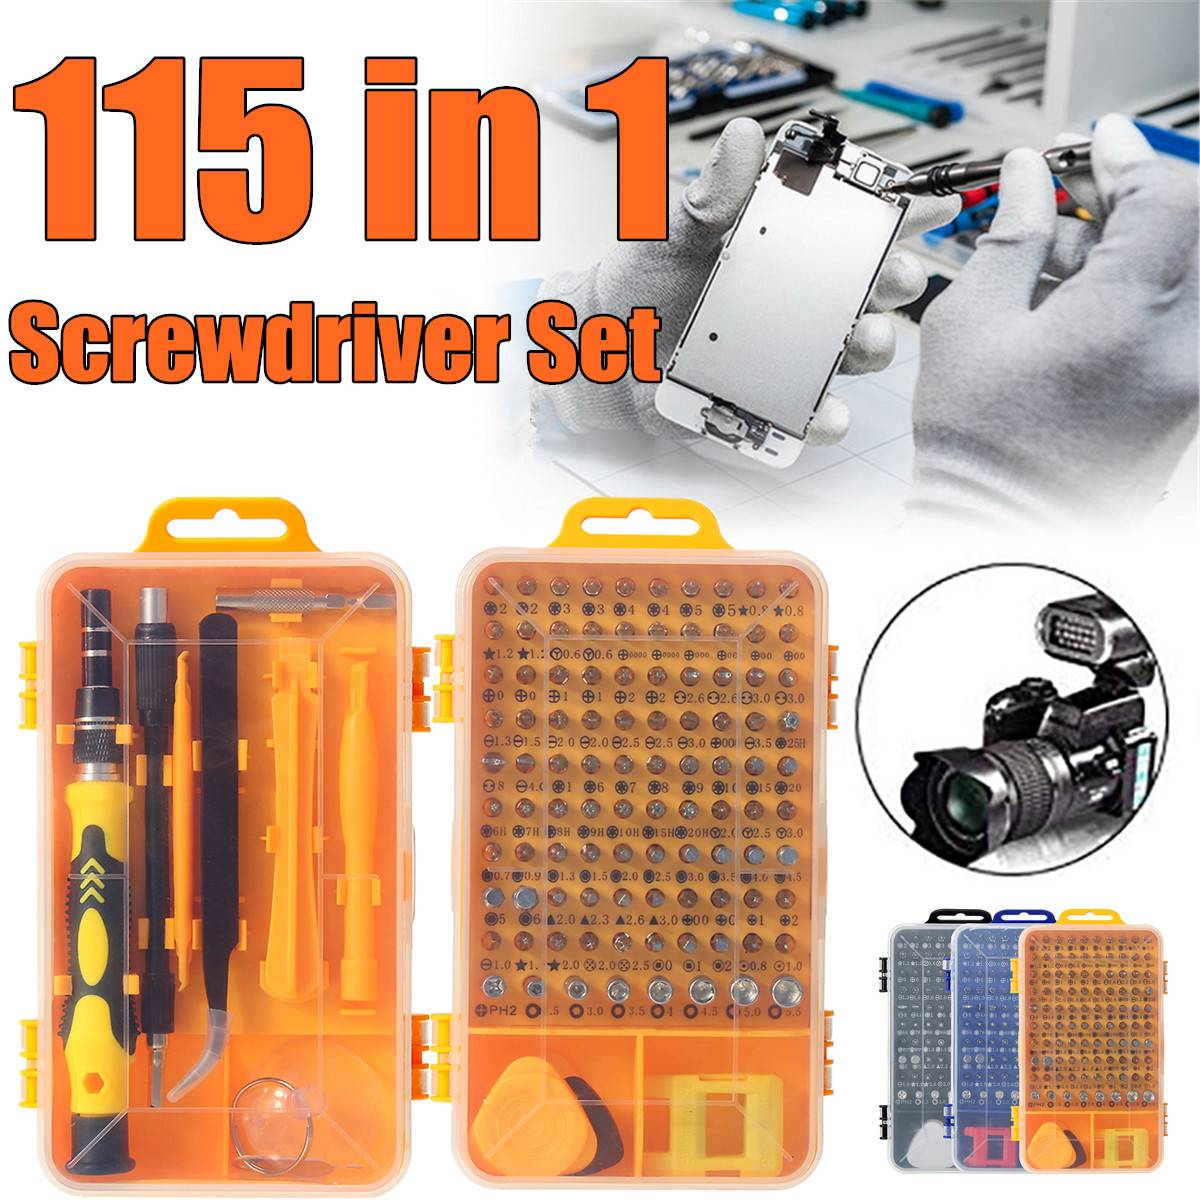 115 In 1 Screwdriver Set Mini Precision Screwdriver Multi Computer PC Mobile Phone Device Repair Hand Home Tools Screwdriver Set